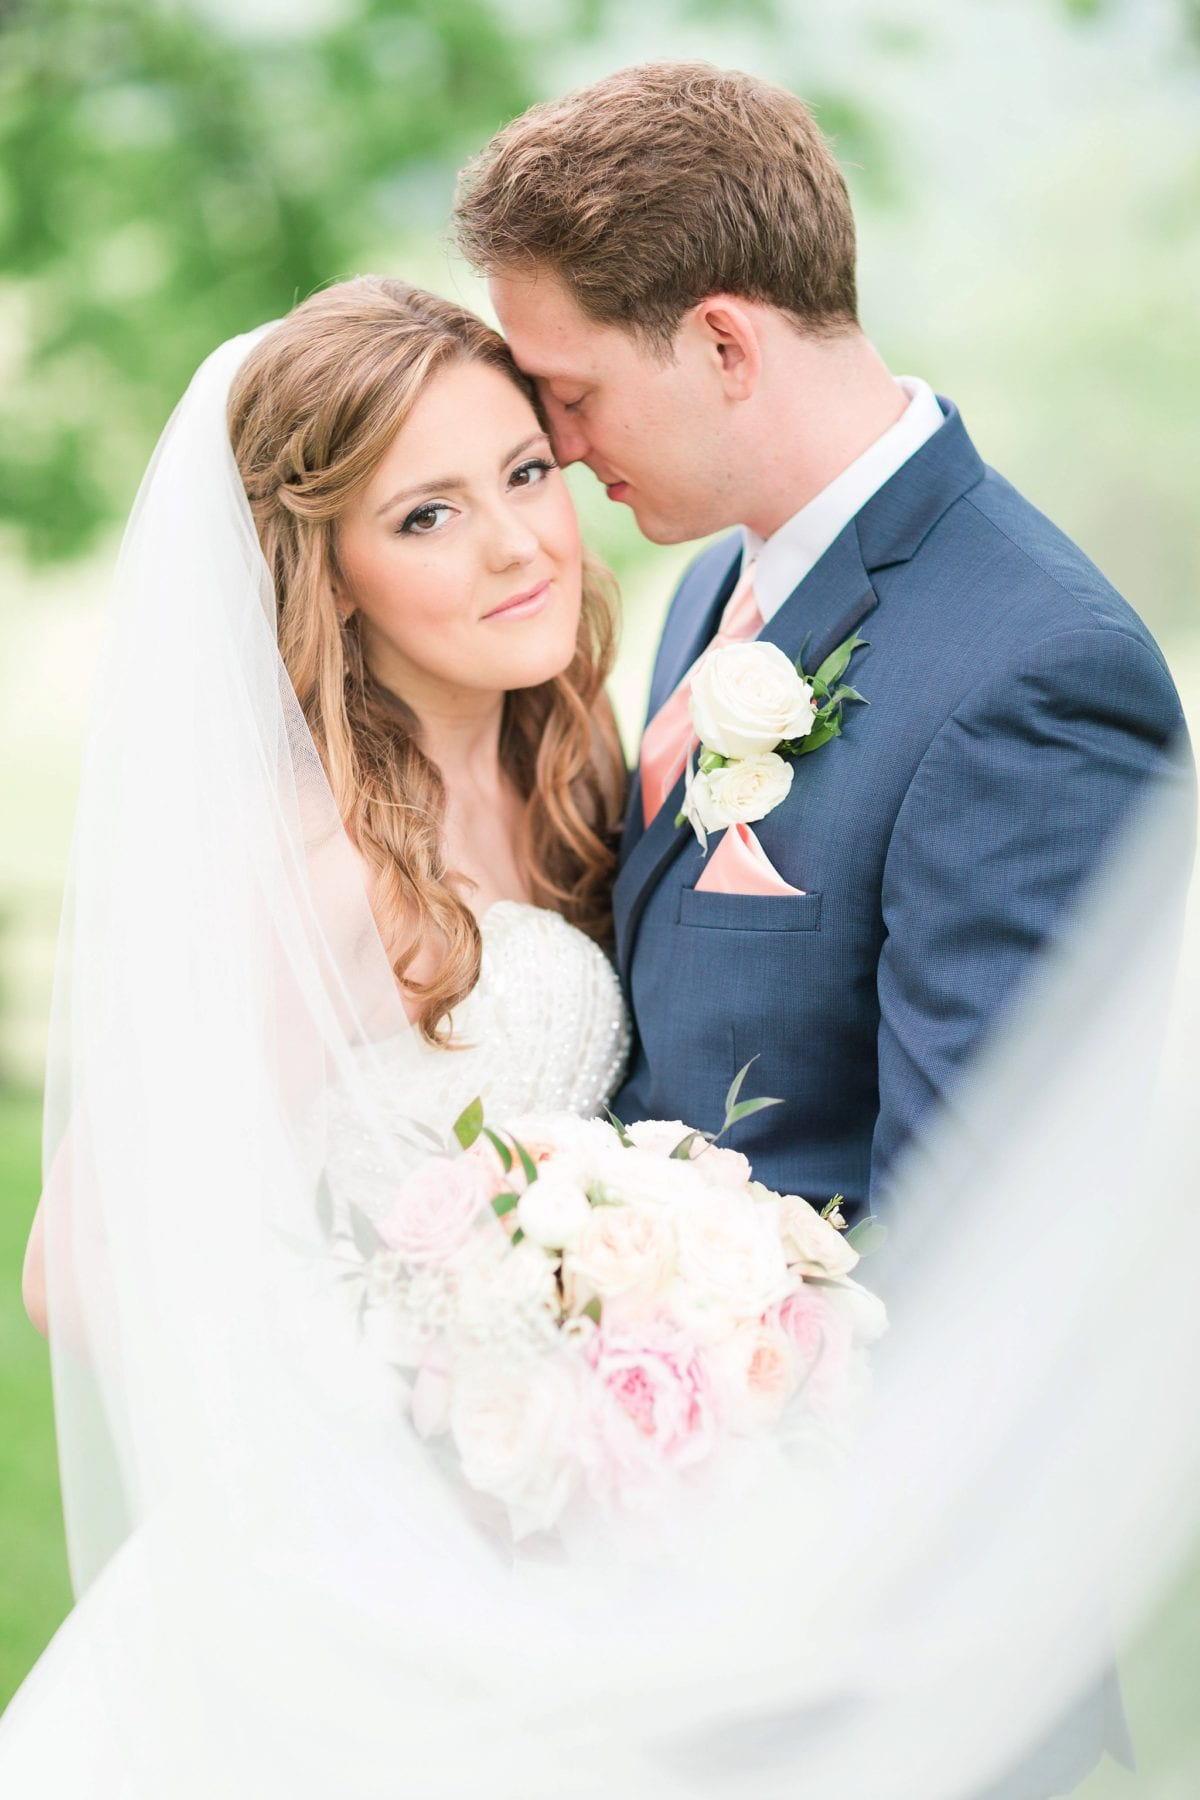 Justin & Megan Big Spring Farm Wedding Photos-186.jpg